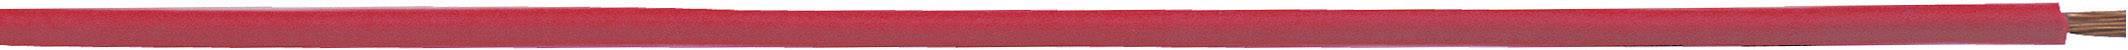 Opletenie / lanko H05V-K 1 x 0.75 mm² žltá LappKabel 4510112 100 m